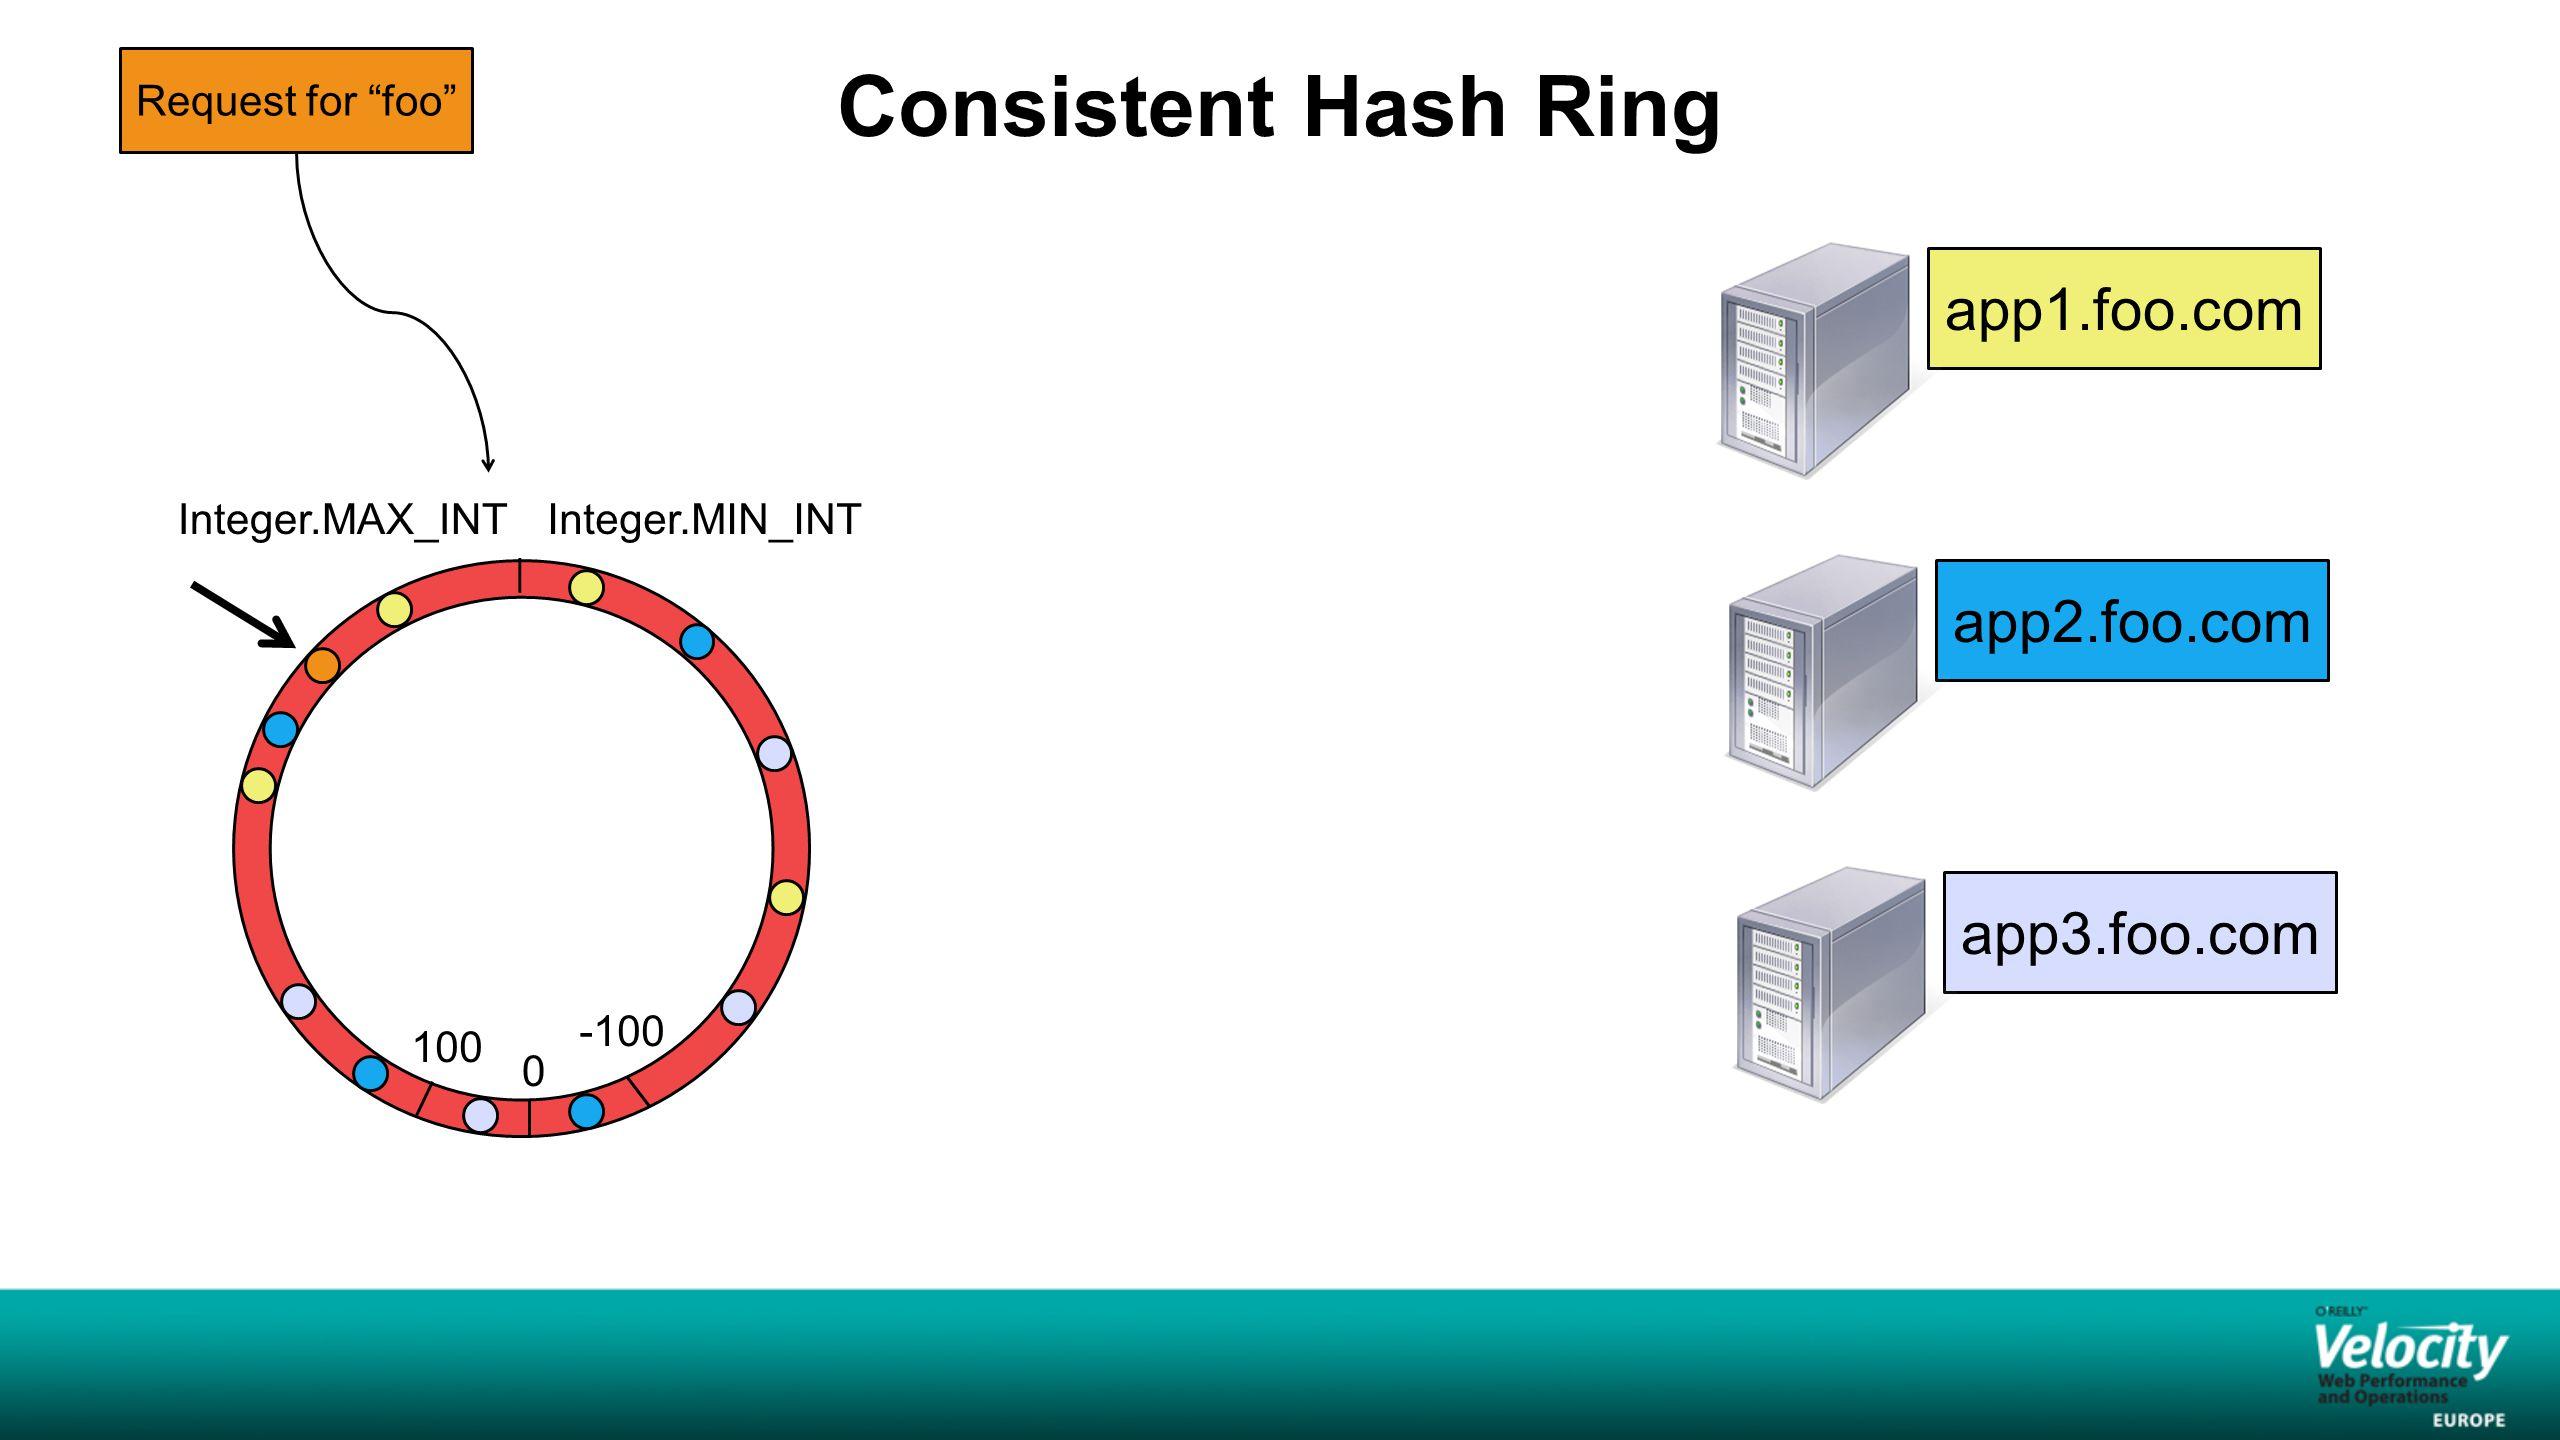 Consistent Hash Ring | Integer.MAX_INTInteger.MIN_INT 0 100 -100 app1.foo.com app2.foo.com app3.foo.com Request for foo